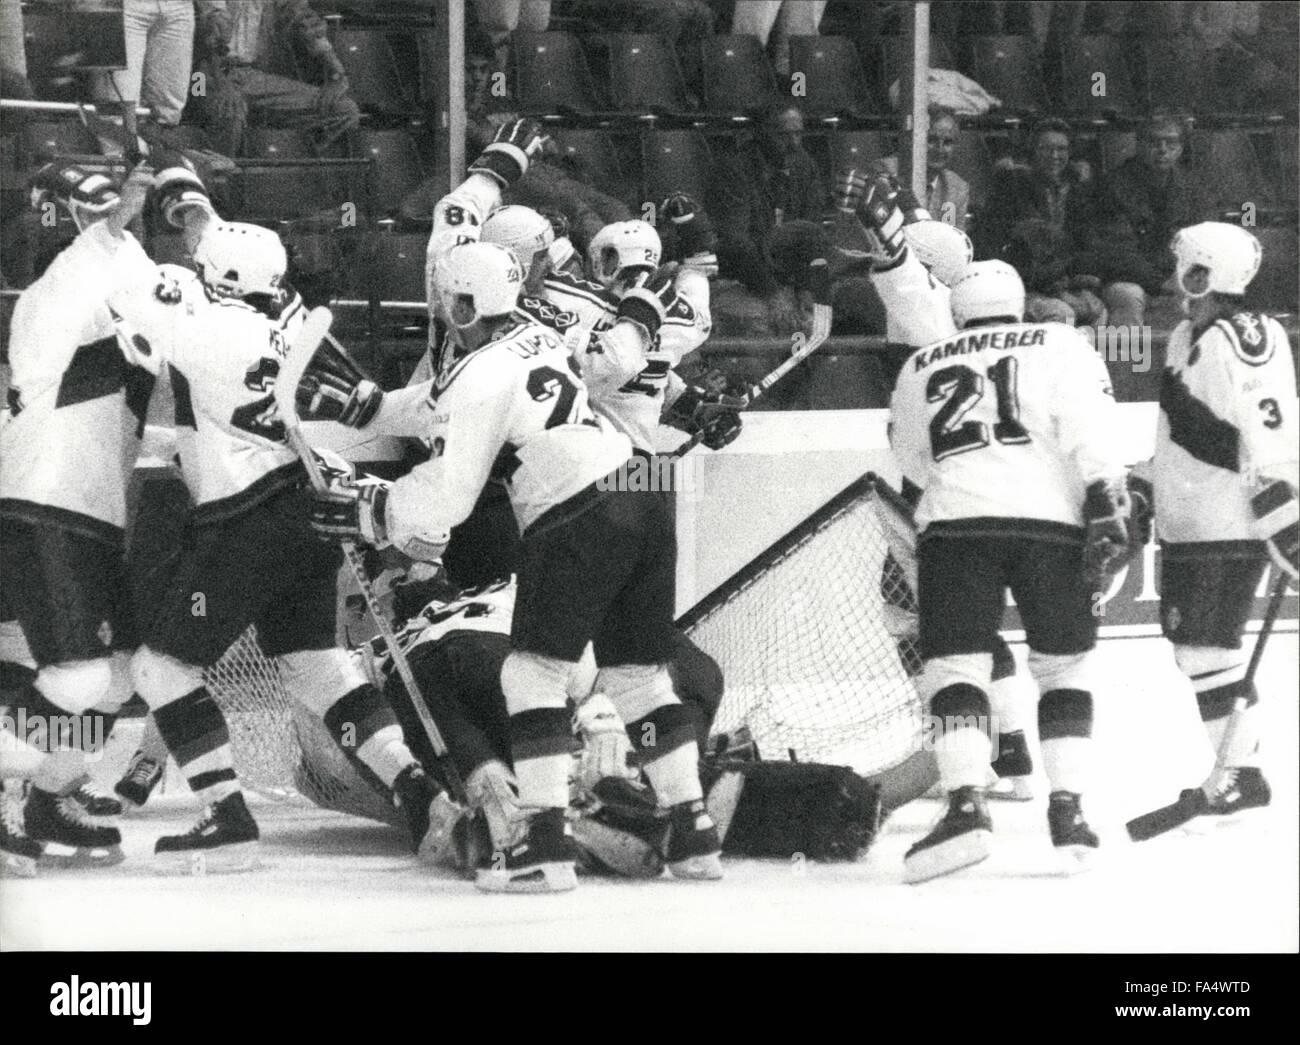 1970 - Ice Hockey world championships in Switzerland: The ice ...